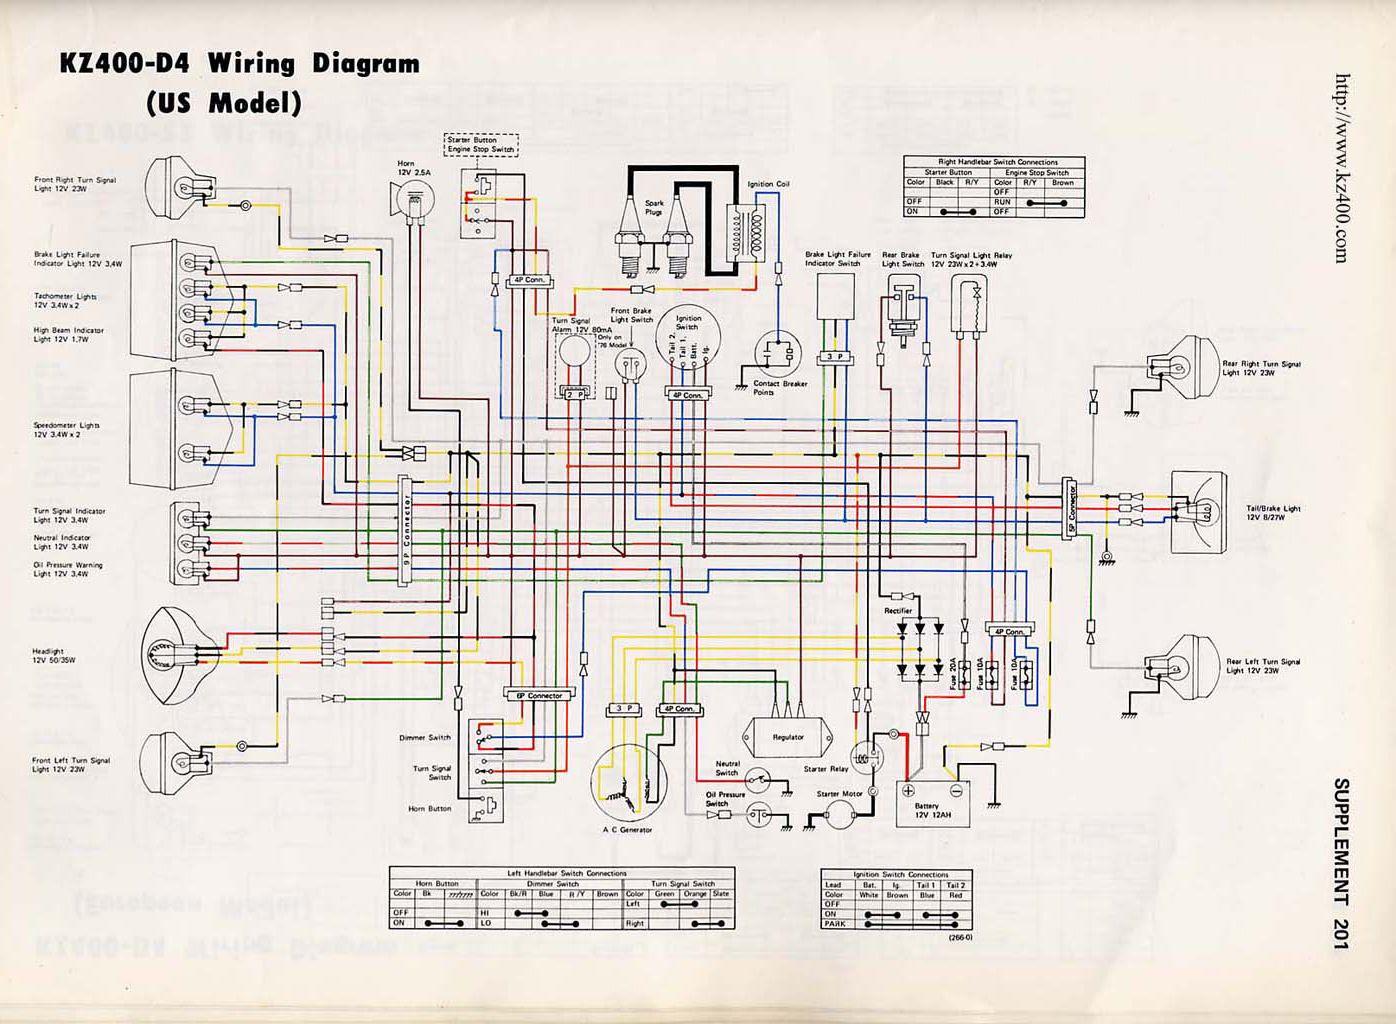 hight resolution of kawasaki 400 wiring diagram wiring diagram yerkz400 wiring diagram wiring diagram gol 1998 kawasaki prairie 400